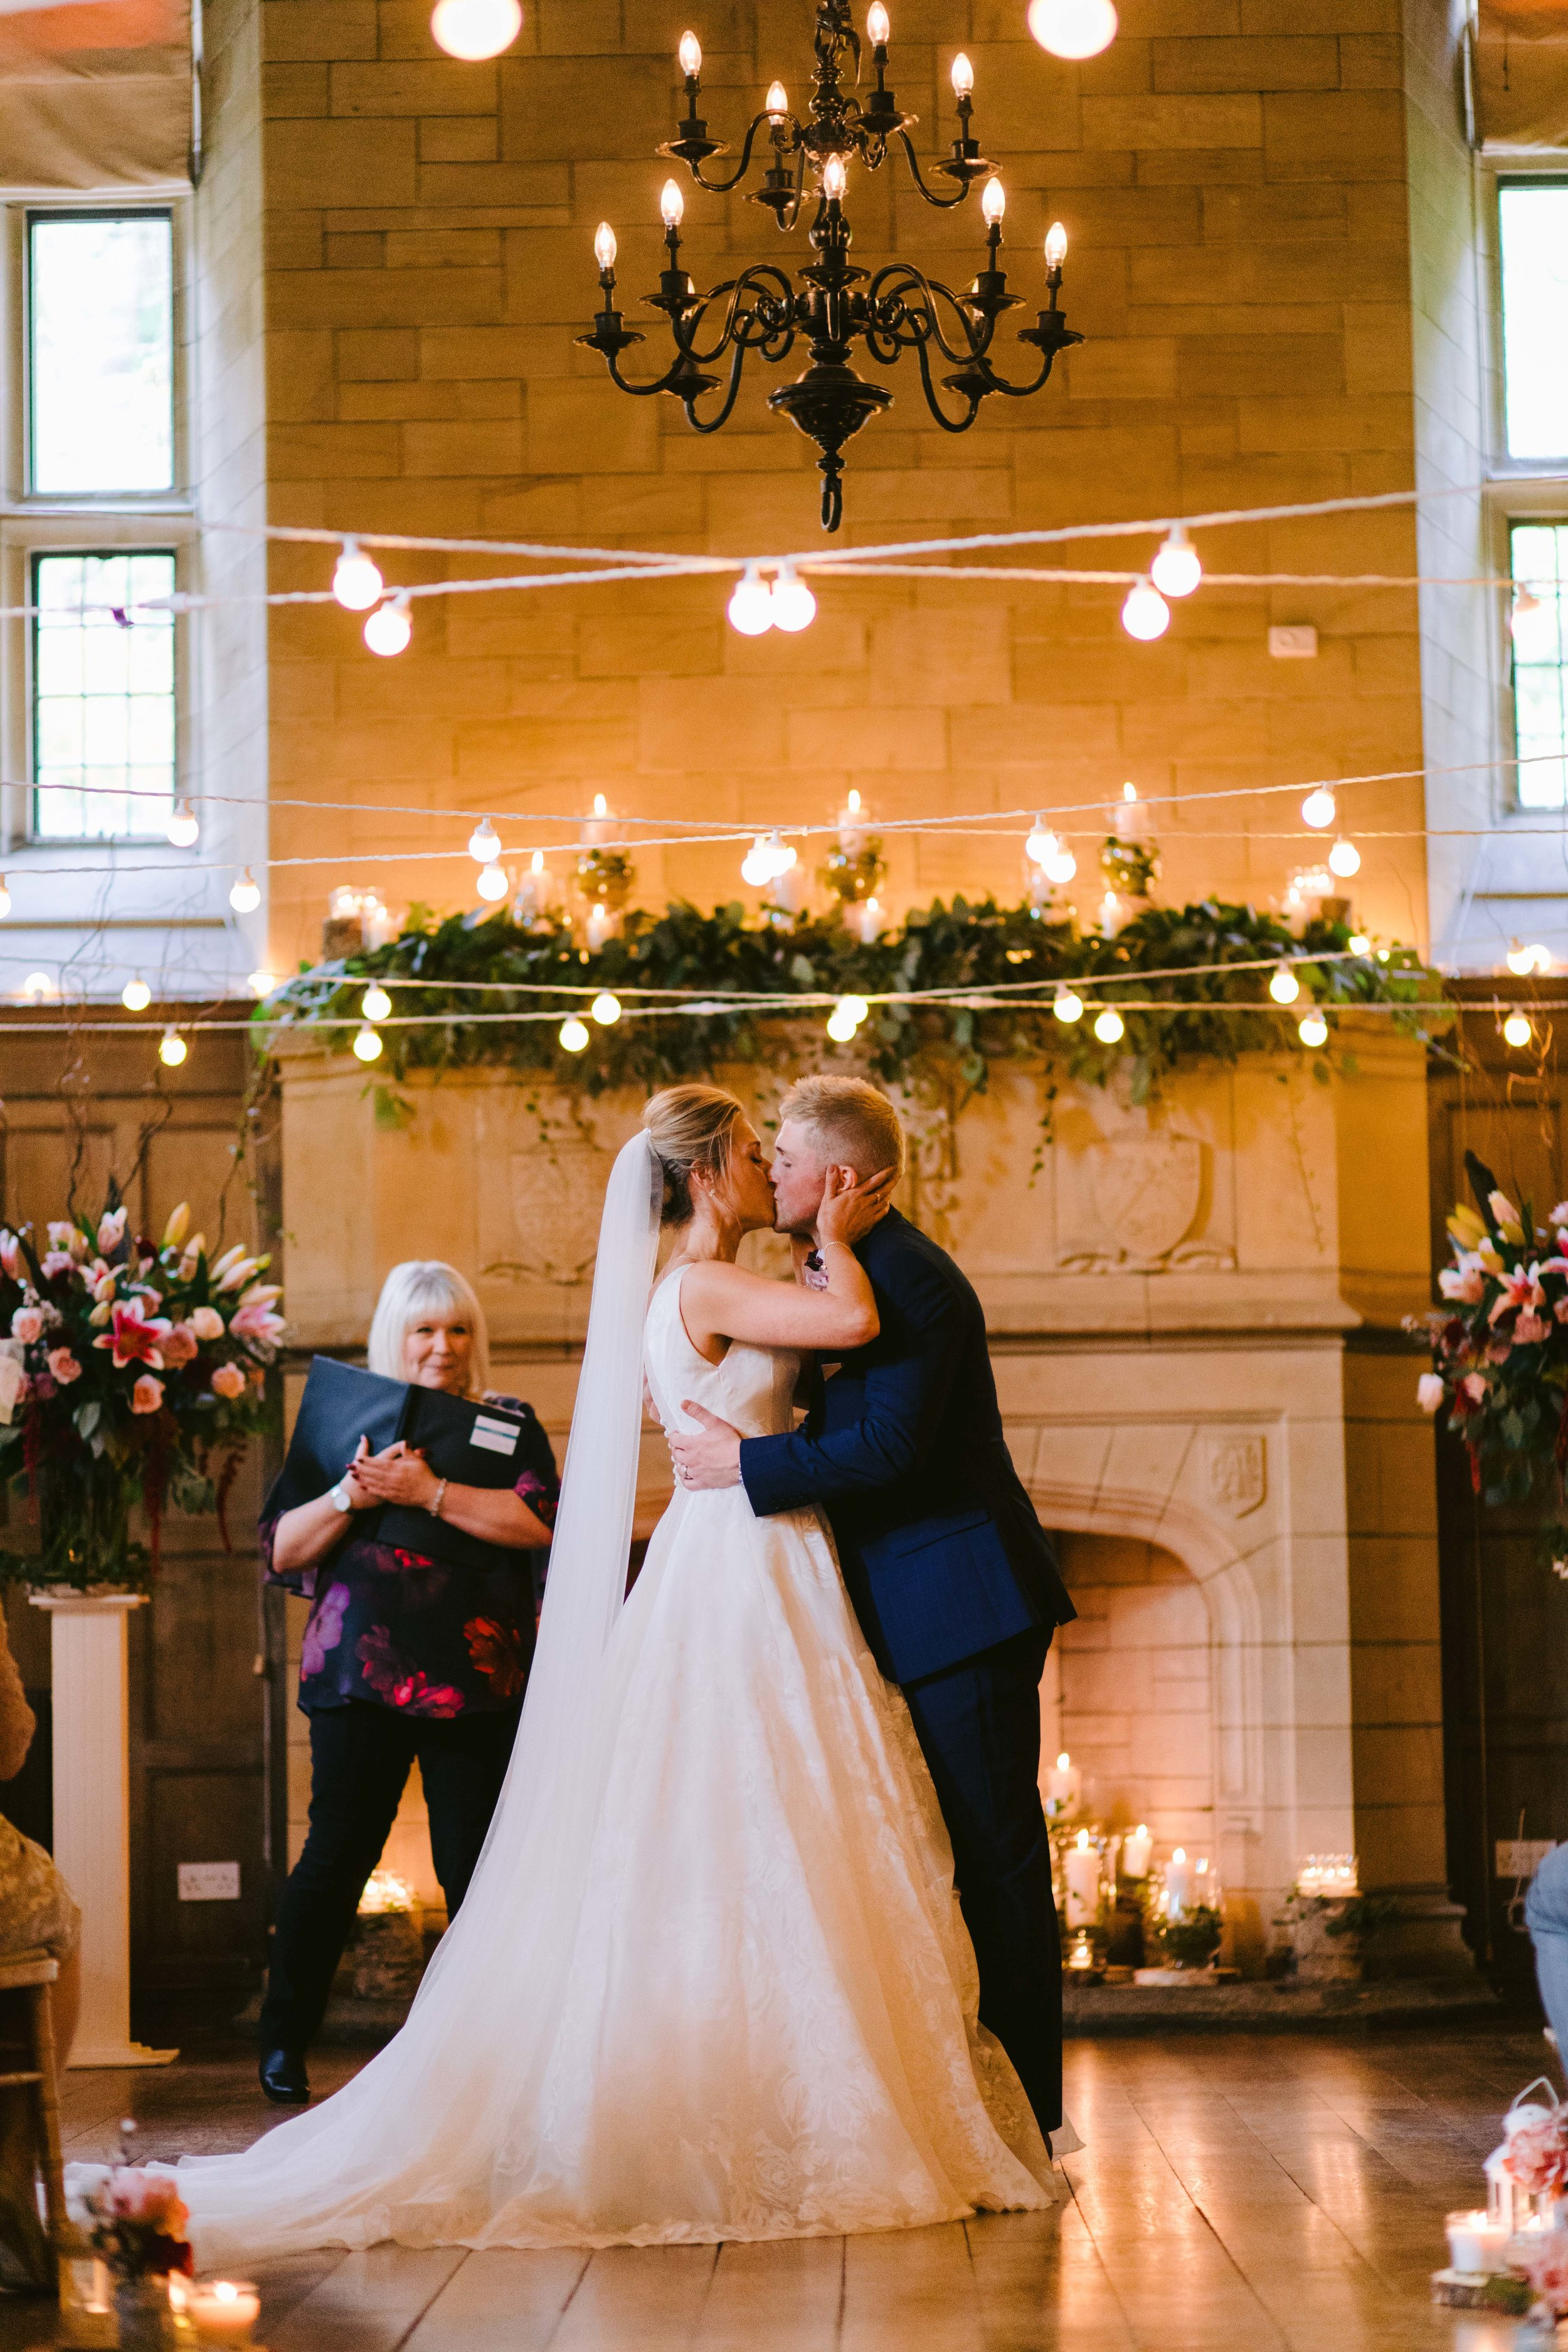 Karin_and_Shauns_Wedding_-_Achnagairn_Castle_-_www.eilidhrobertson.co.uk-515.jpg